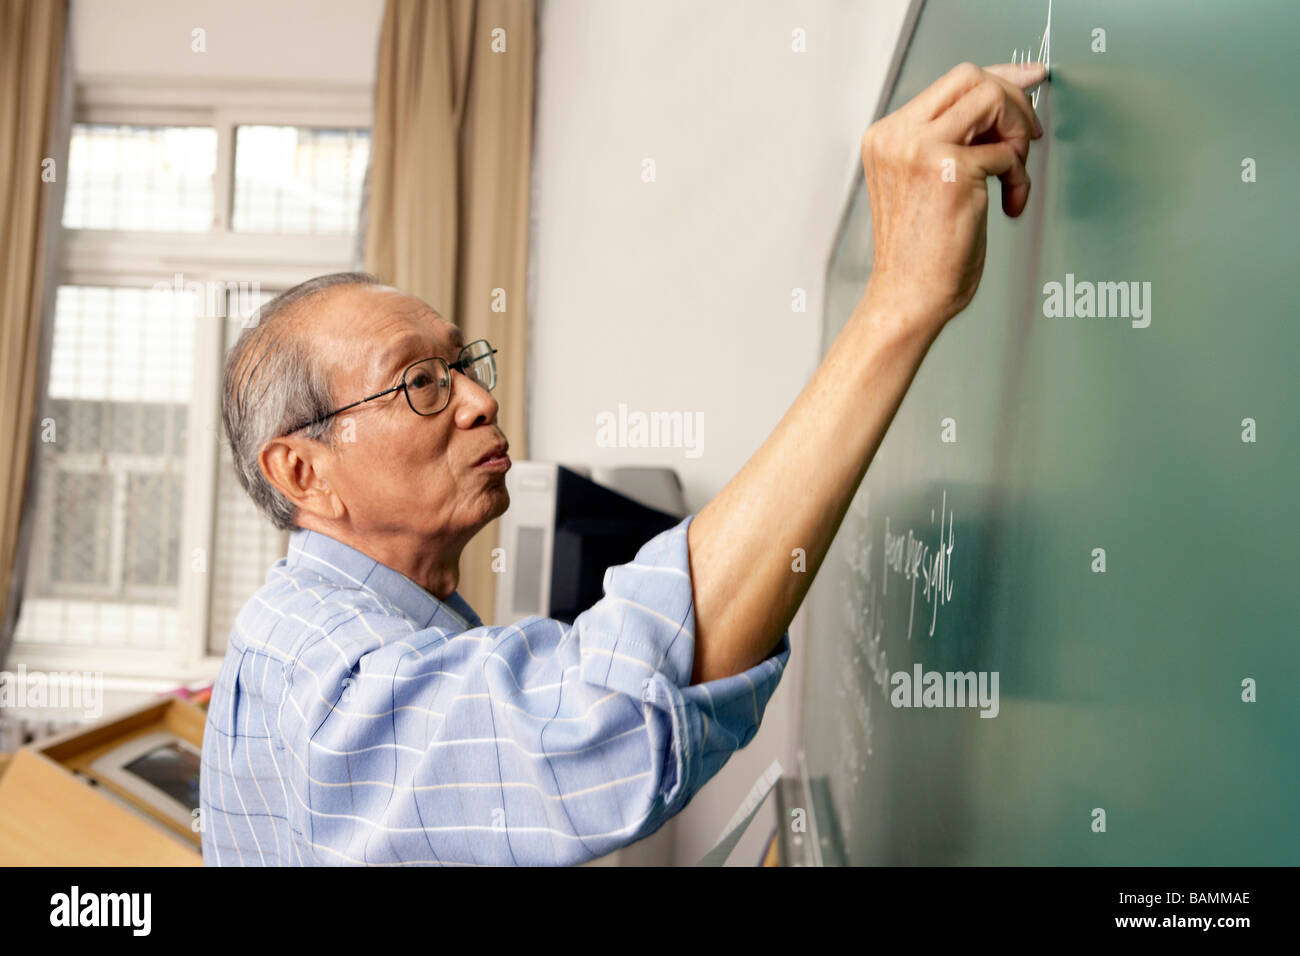 Teacher Writing On Blackboard - Stock Image